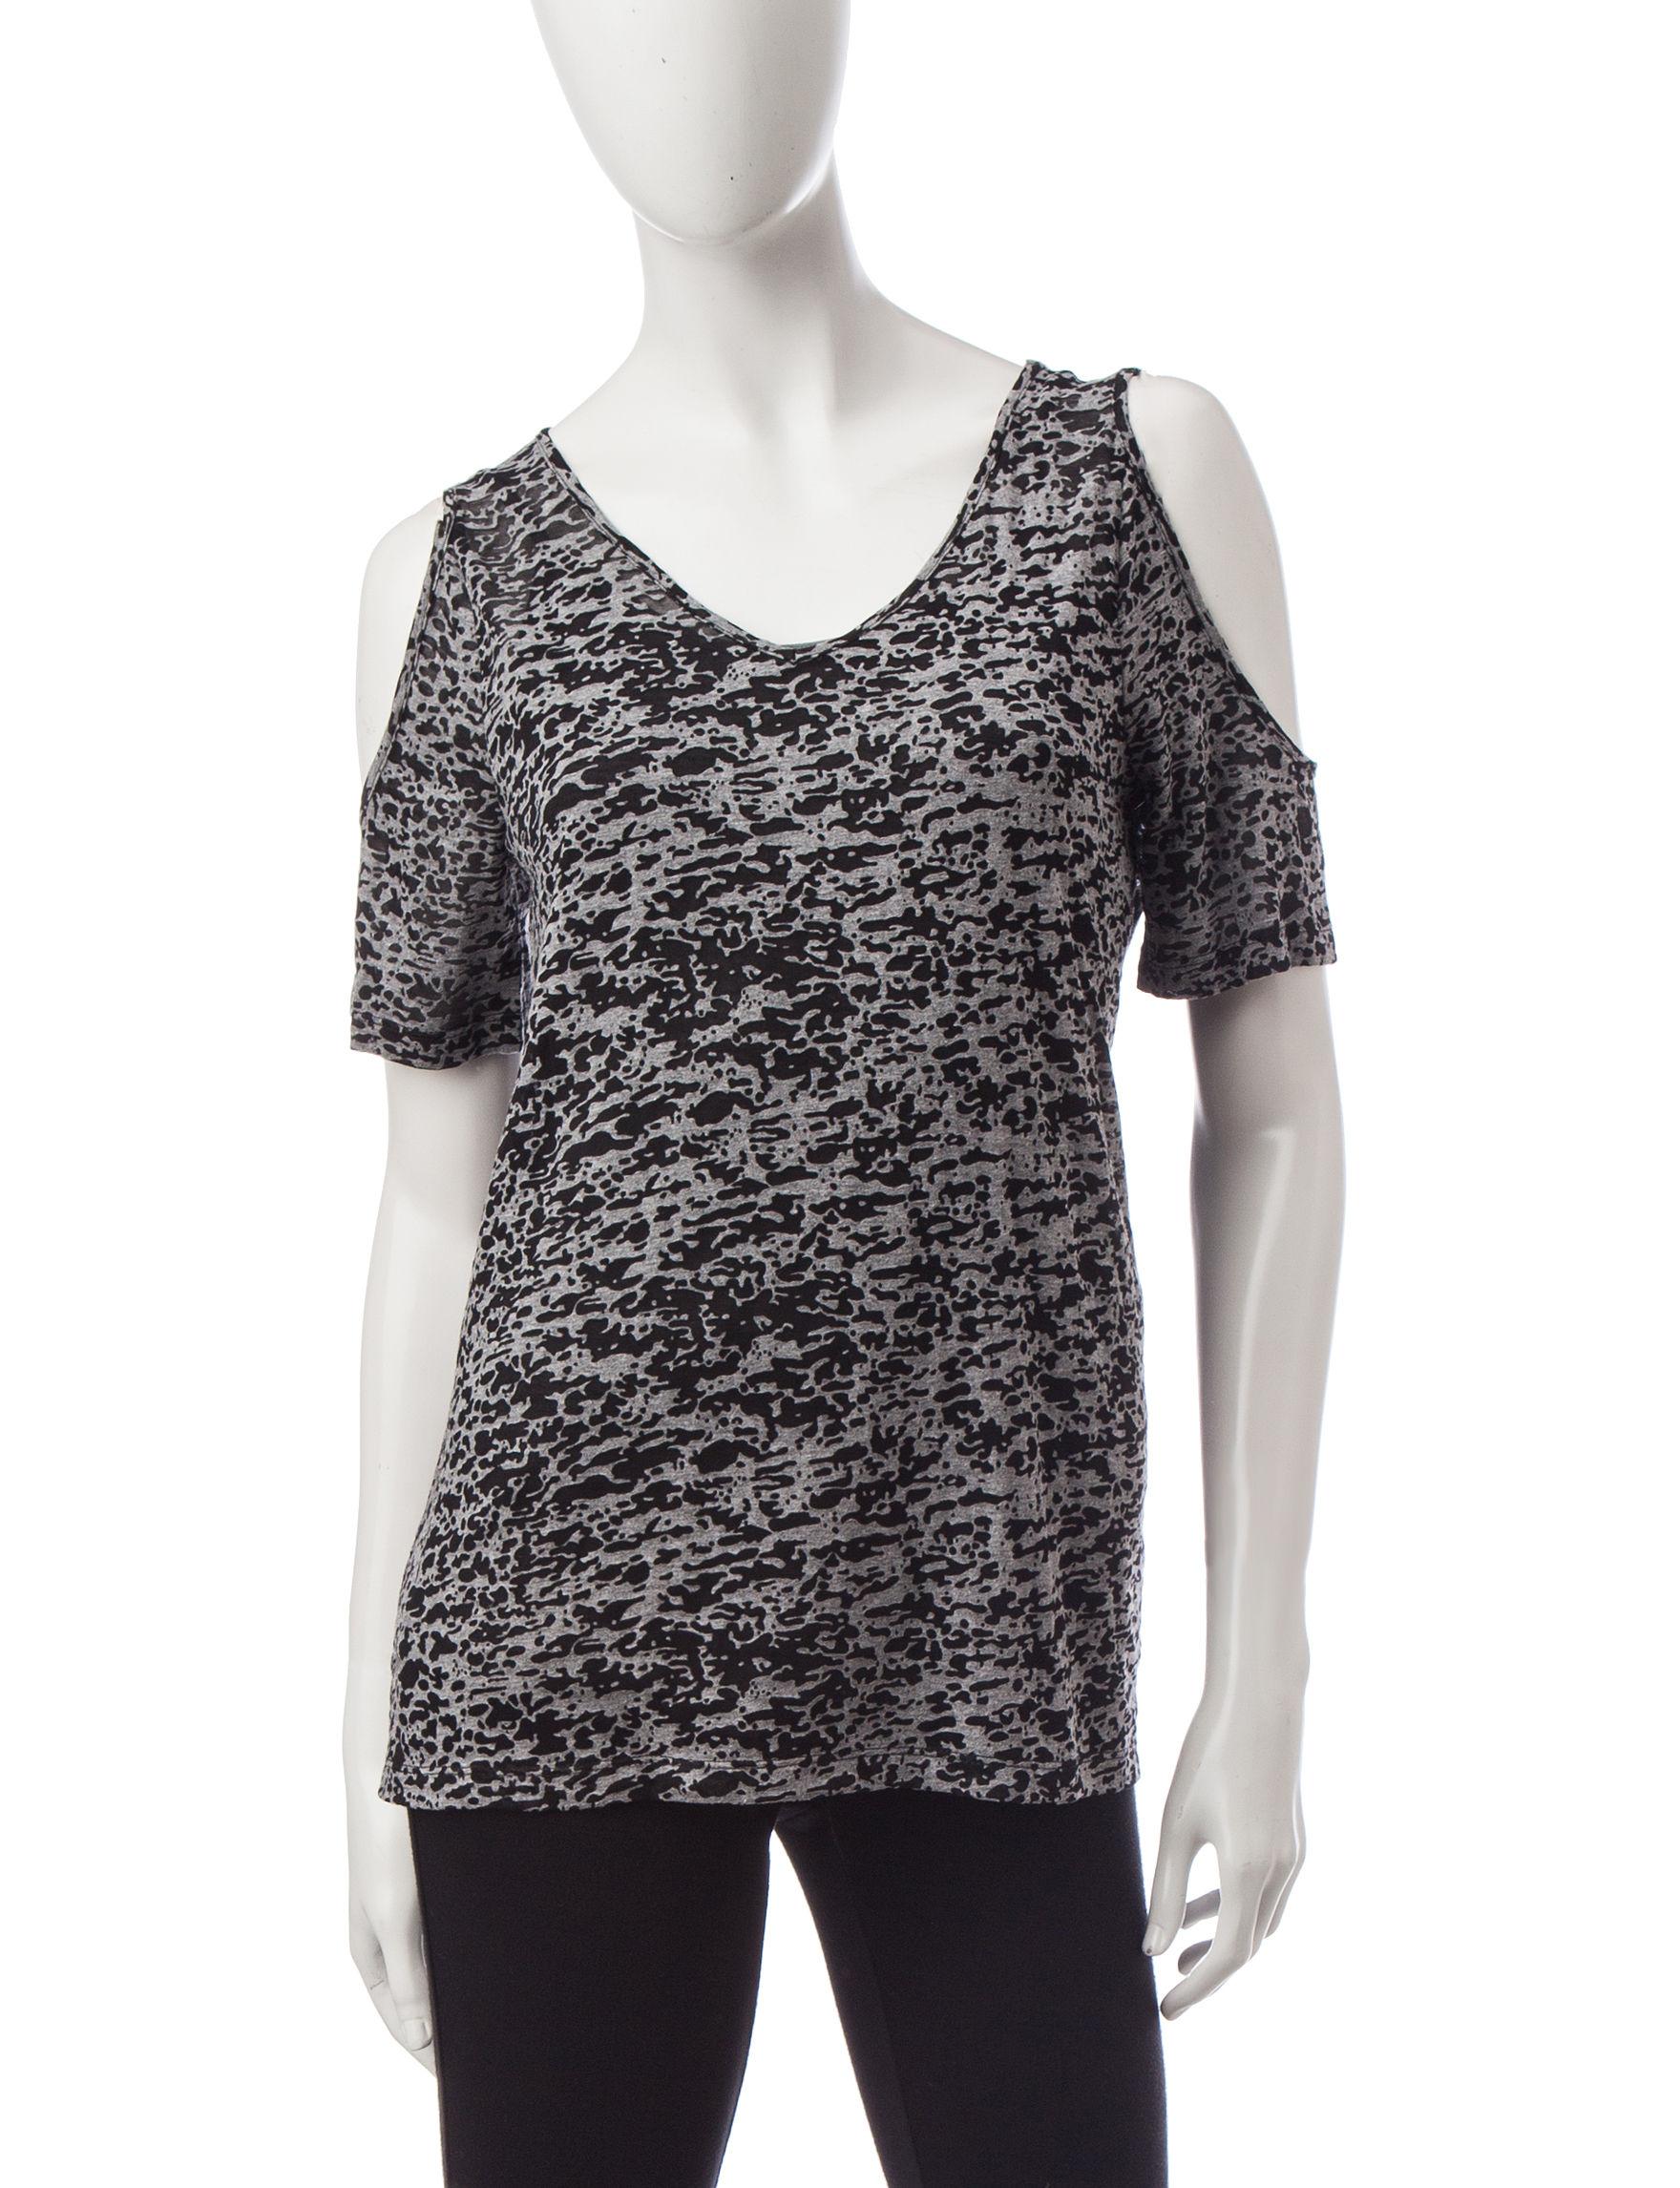 Signature Studio Grey / Black Shirts & Blouses